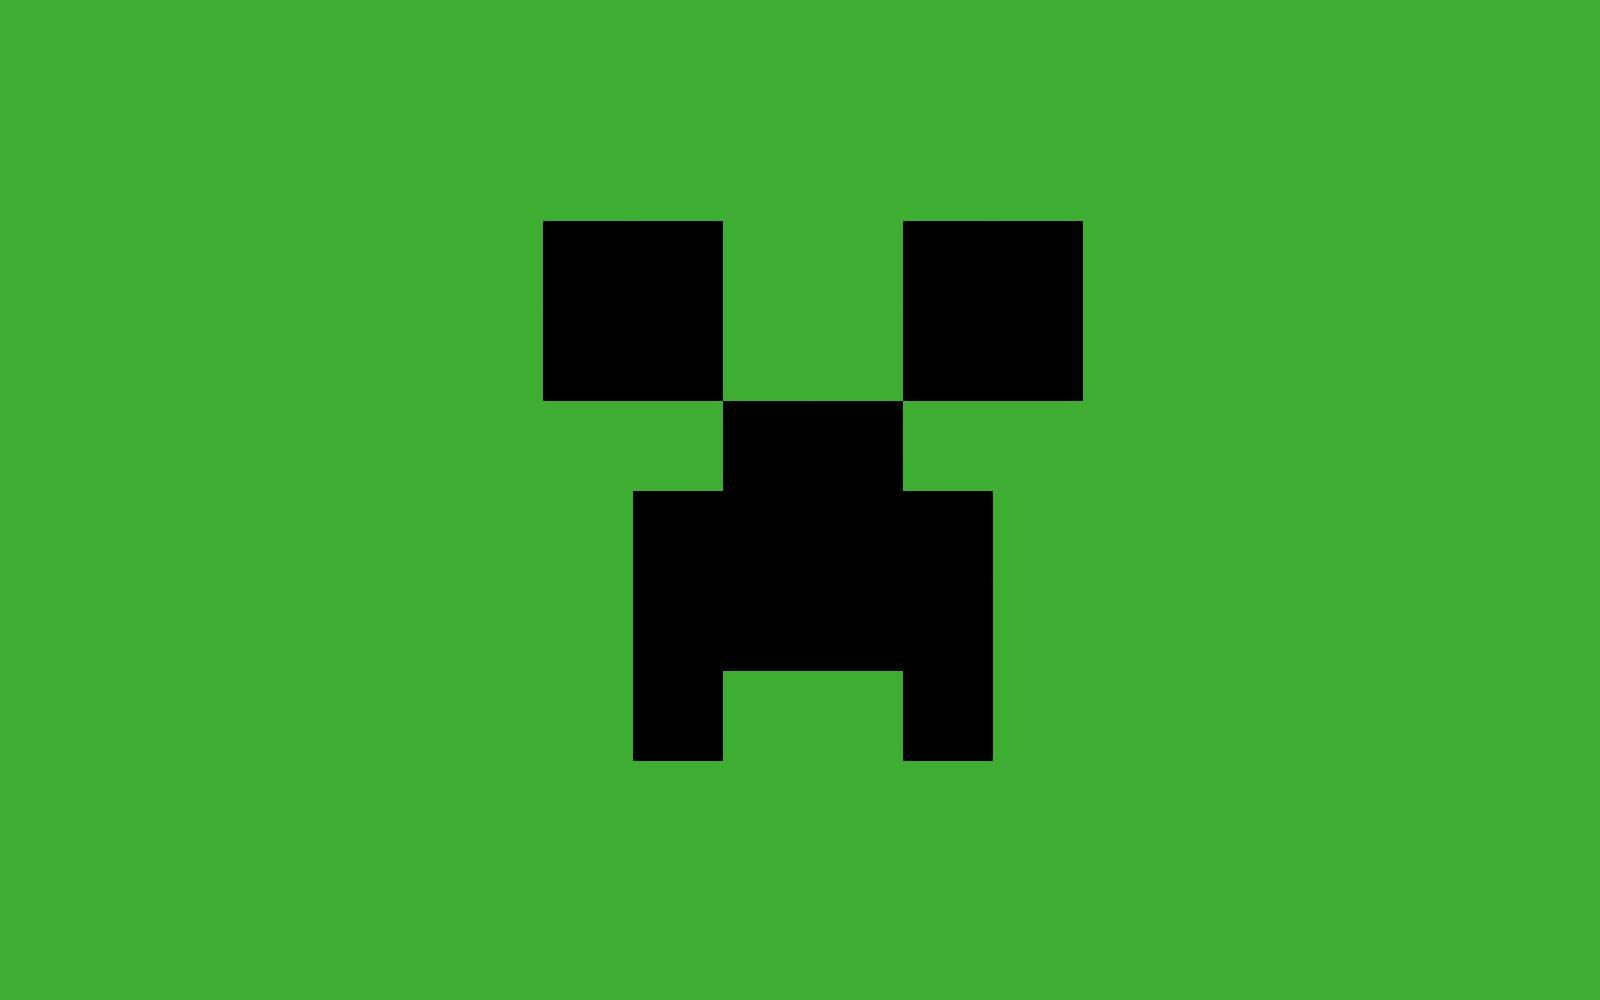 Minecraft Creeper Clipart Clipart Kid Minecraft Wallpaper Creeper Minecraft Creepers